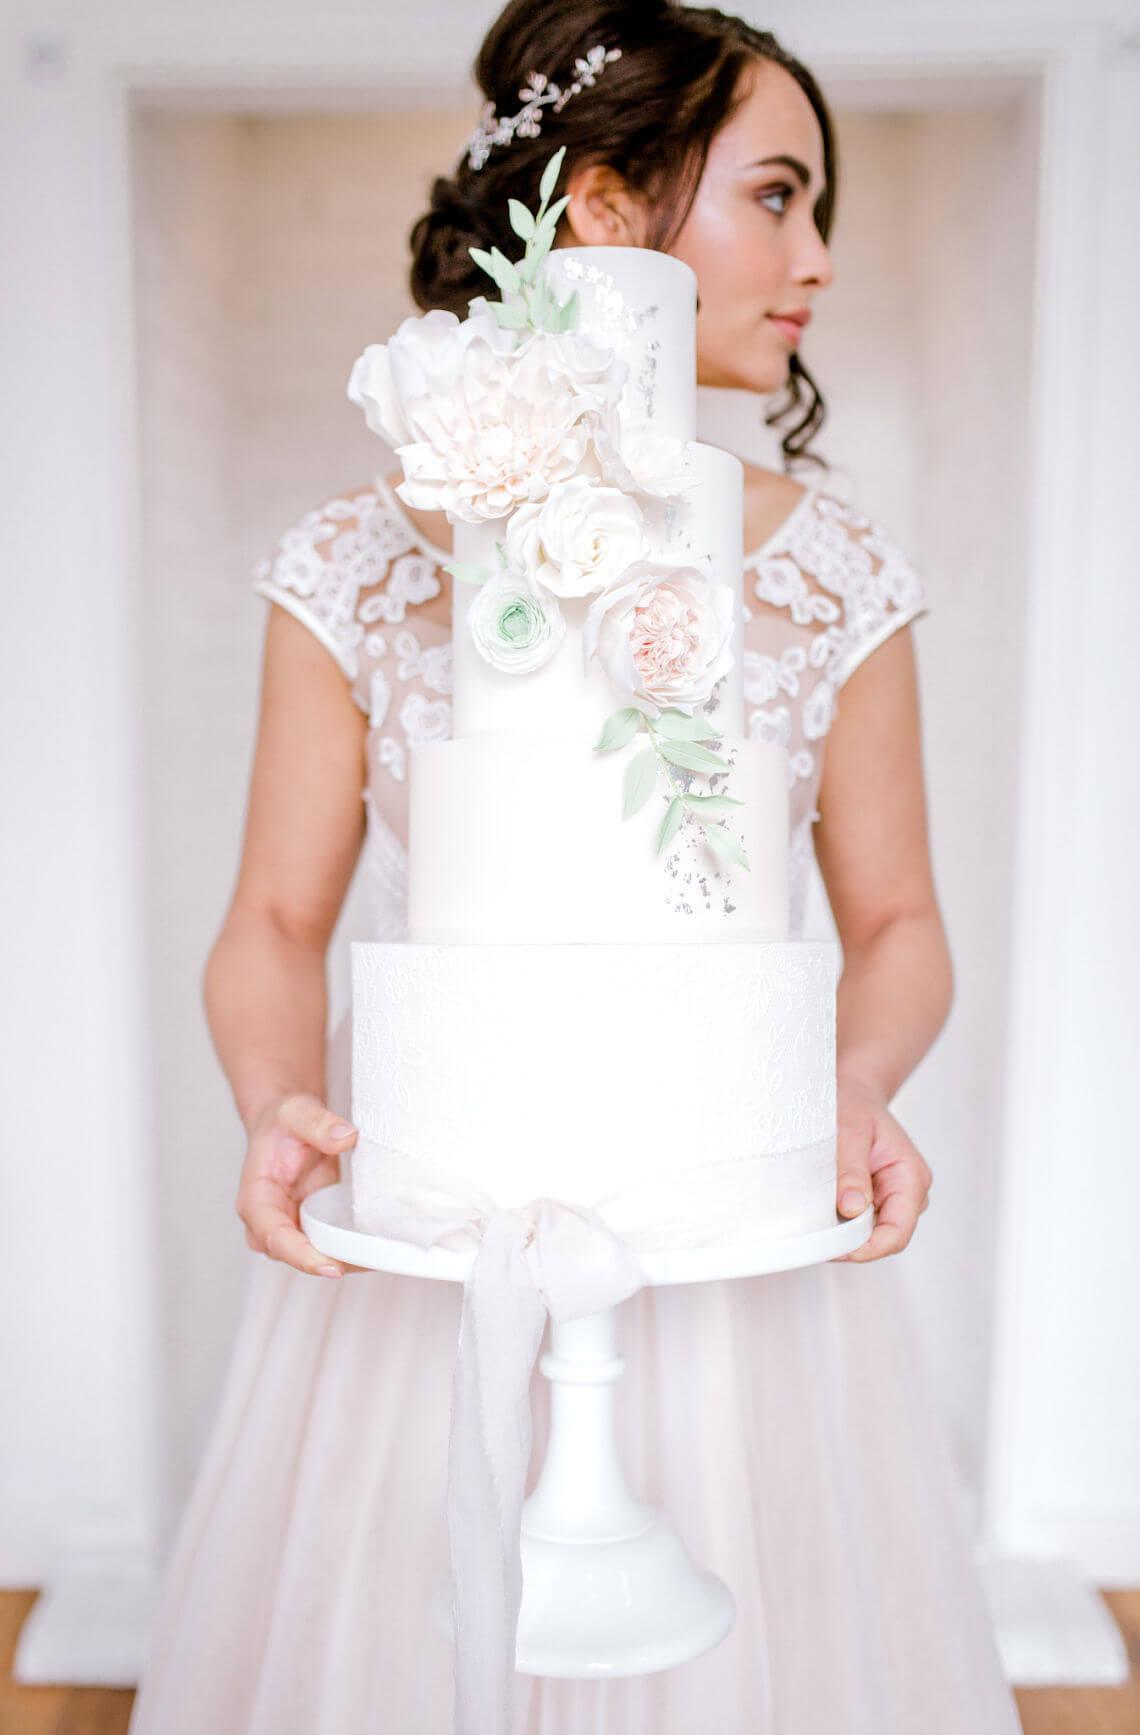 essex-wedding-planner-beautiful-wedding-cake.jpg